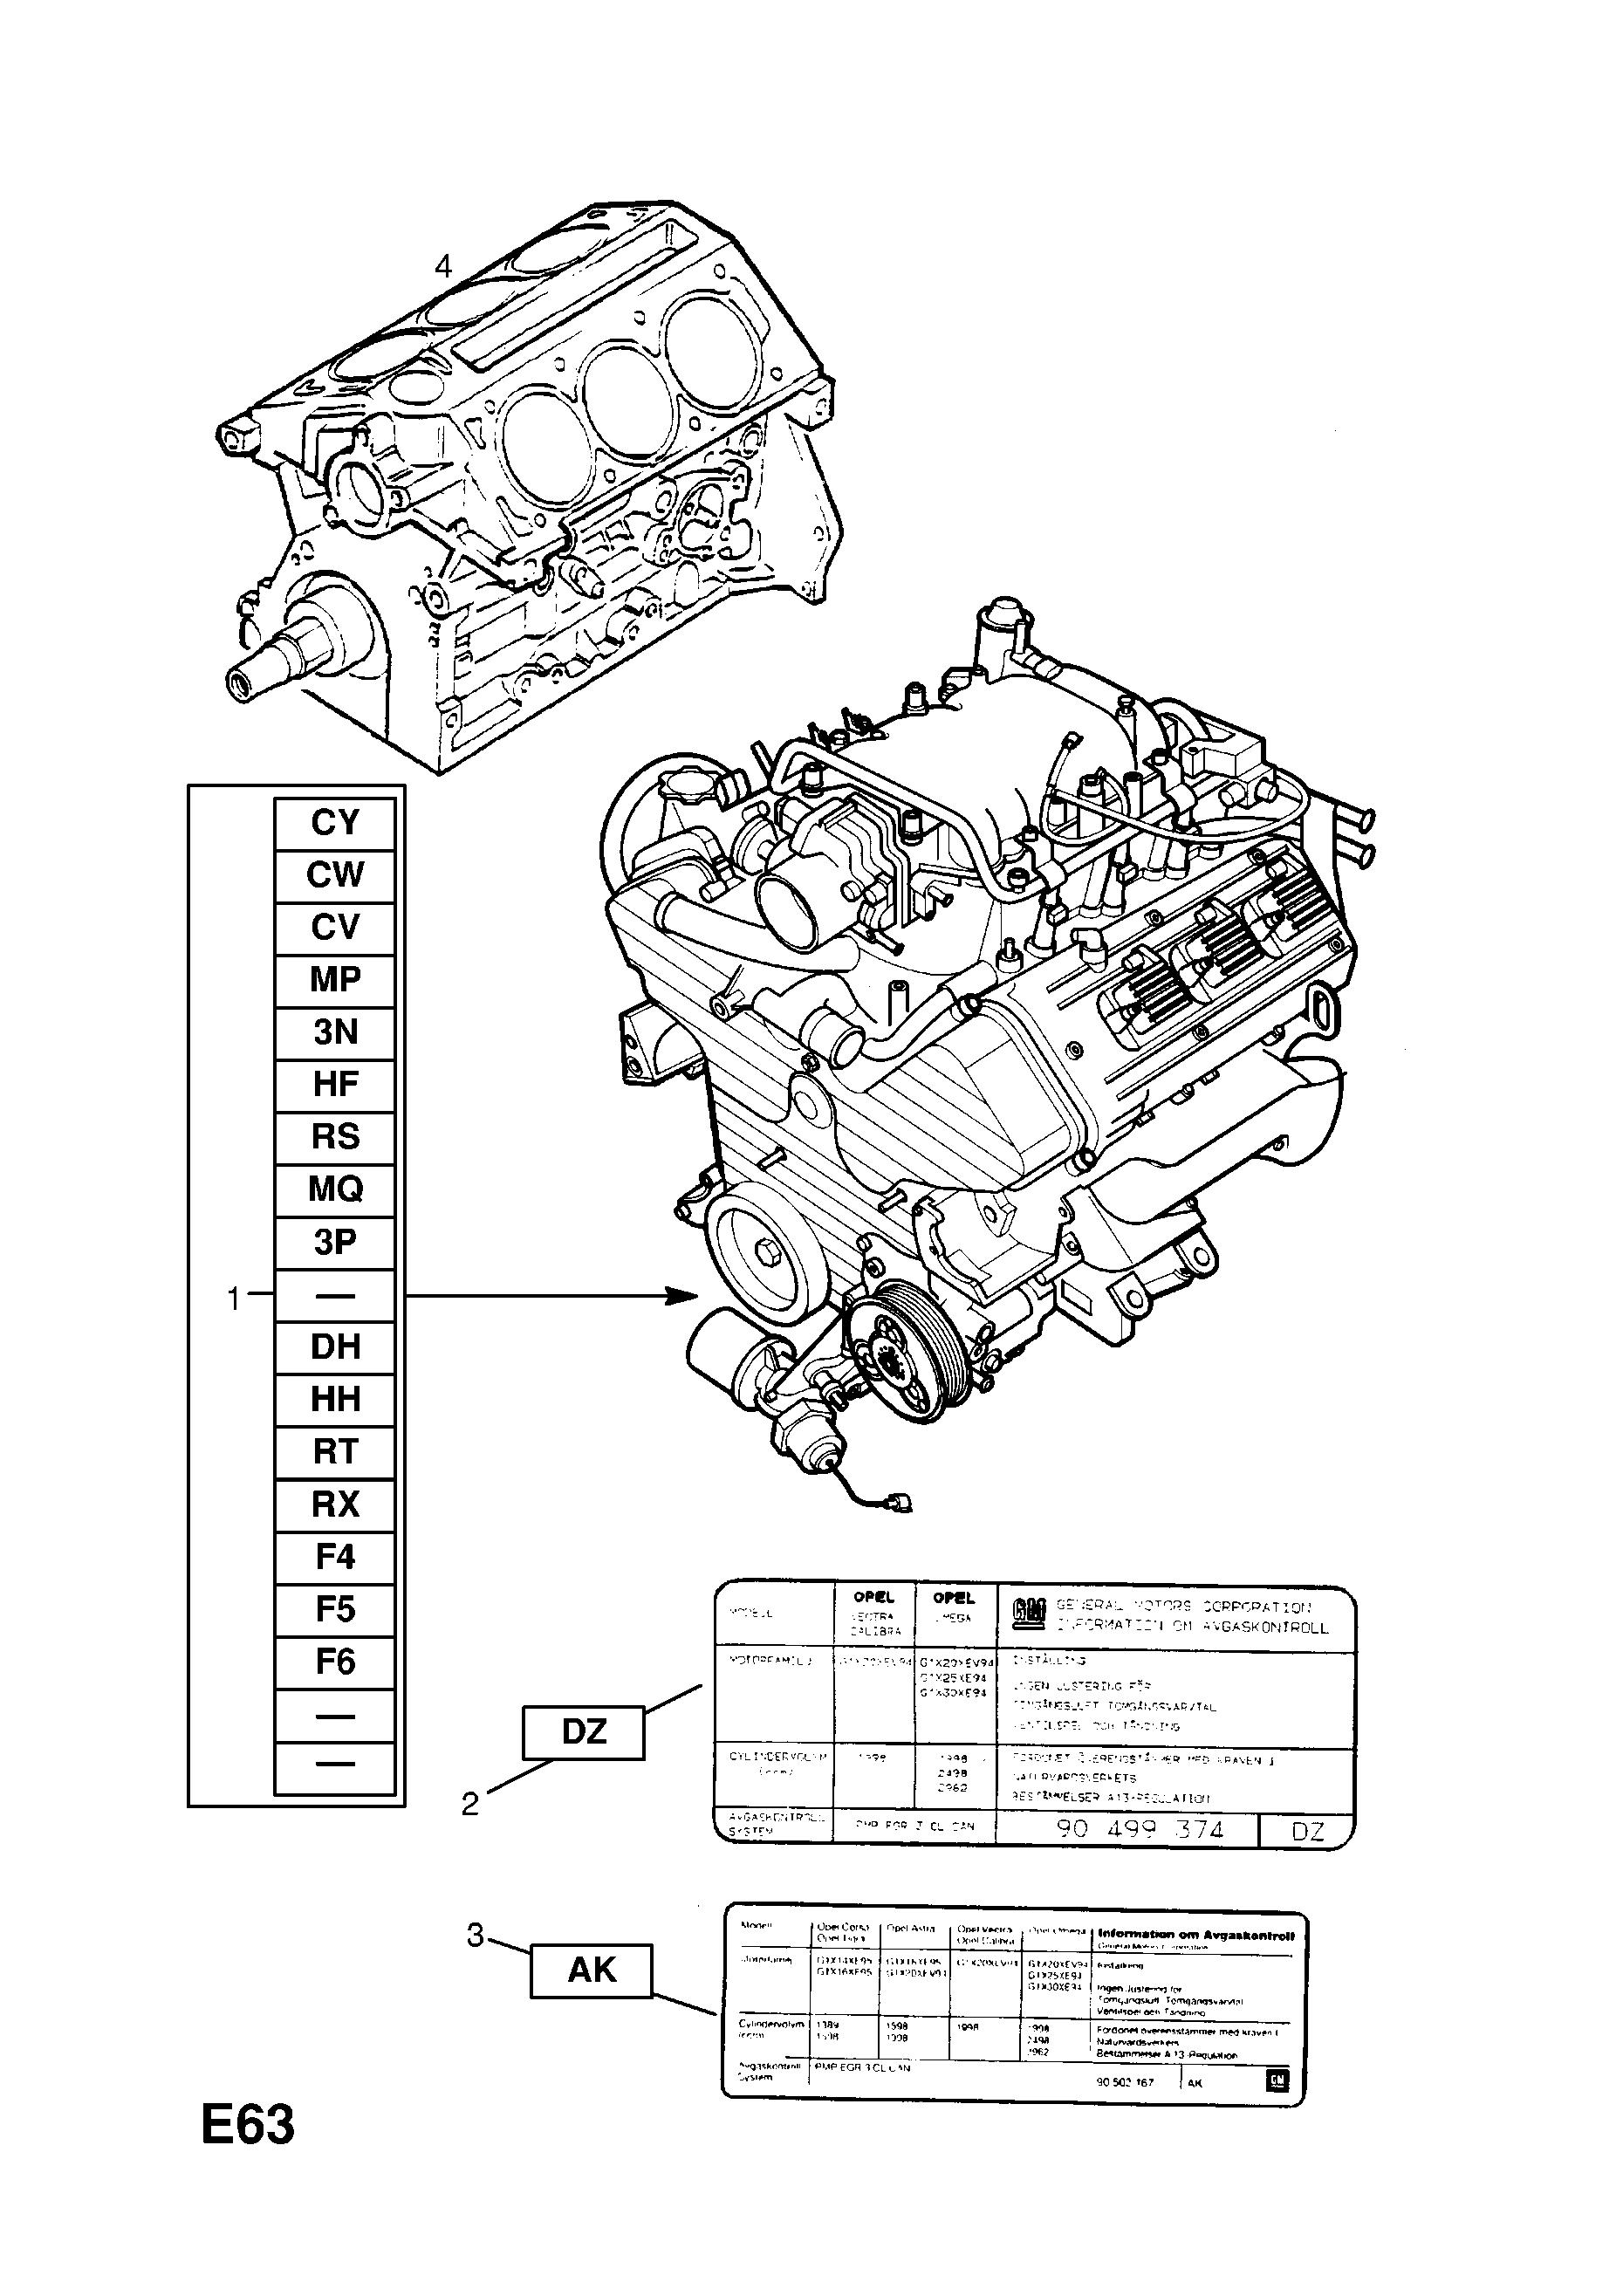 [DIAGRAM_0HG]  Opel OMEGA-B ( 1994 - 2003), E ENGINE AND CLUTCH, 5 X30XE[L81],Y32SE[LA3]  PETROL ENGINES, 50.ENGINE LABELS - Catcar.info | L81 Engine Diagram |  | CATCAR.INFO